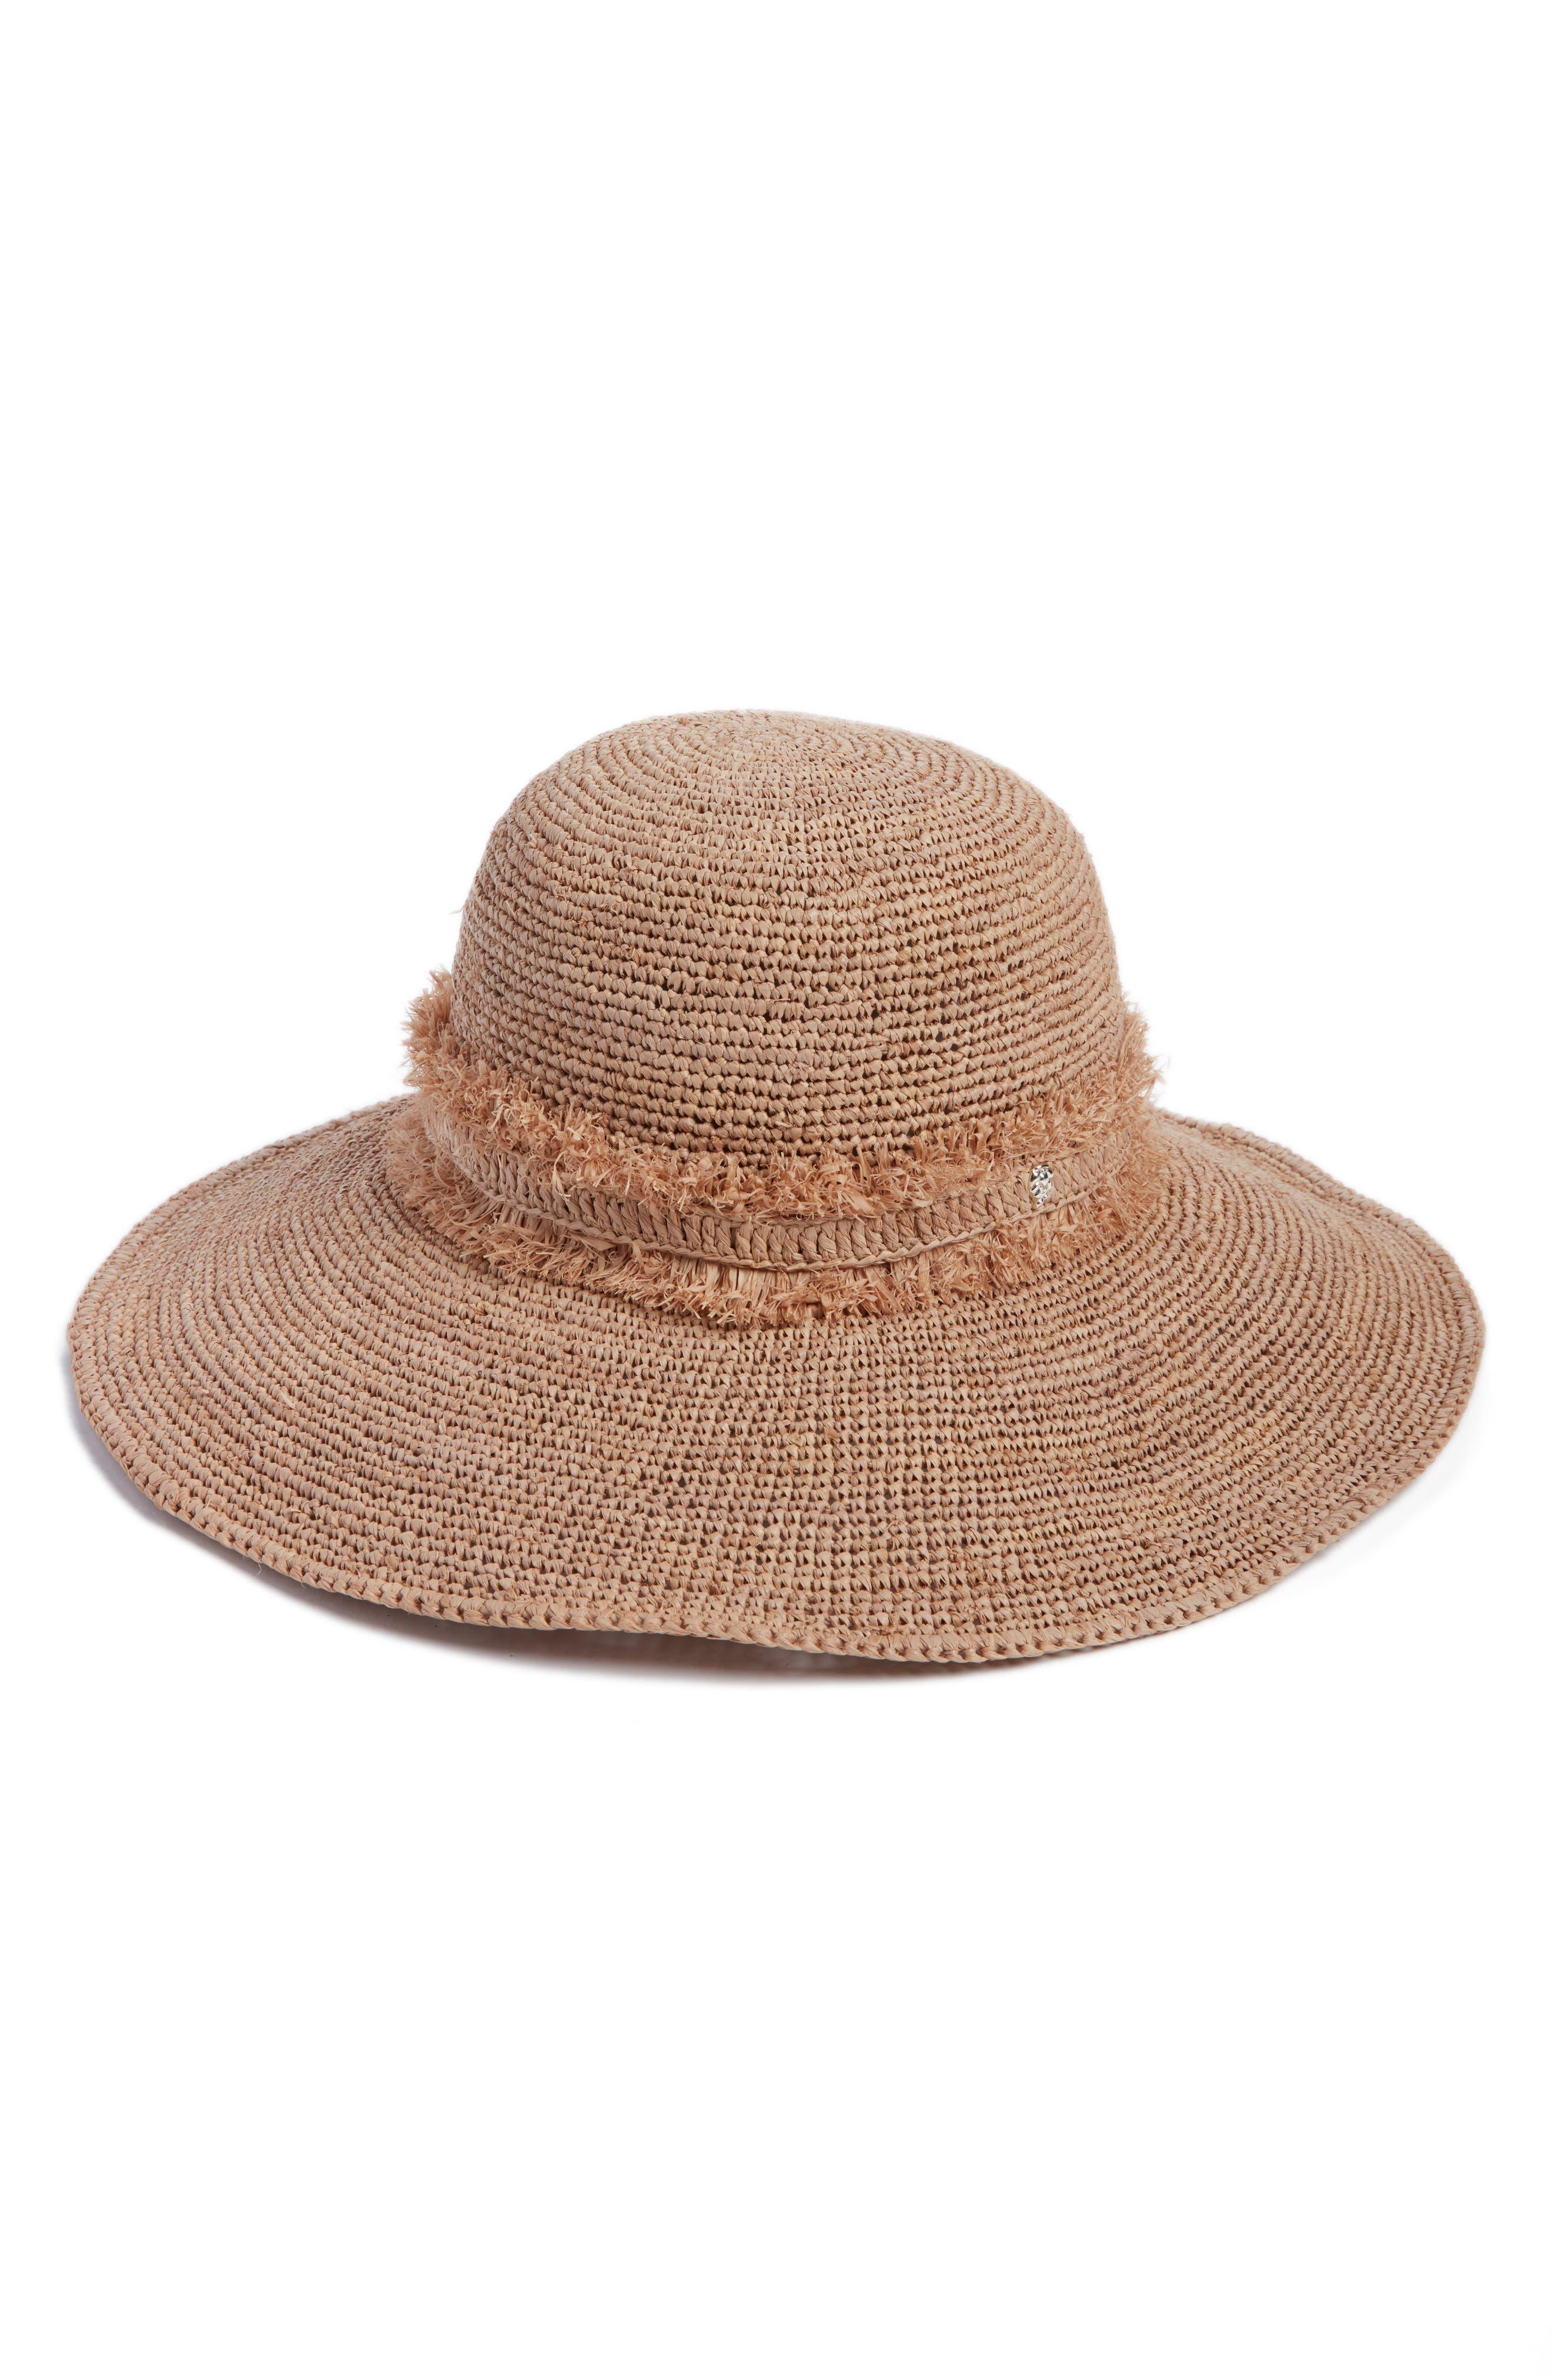 Helen Kaminski Palm Desert Wide Brim Raffia Straw Hat